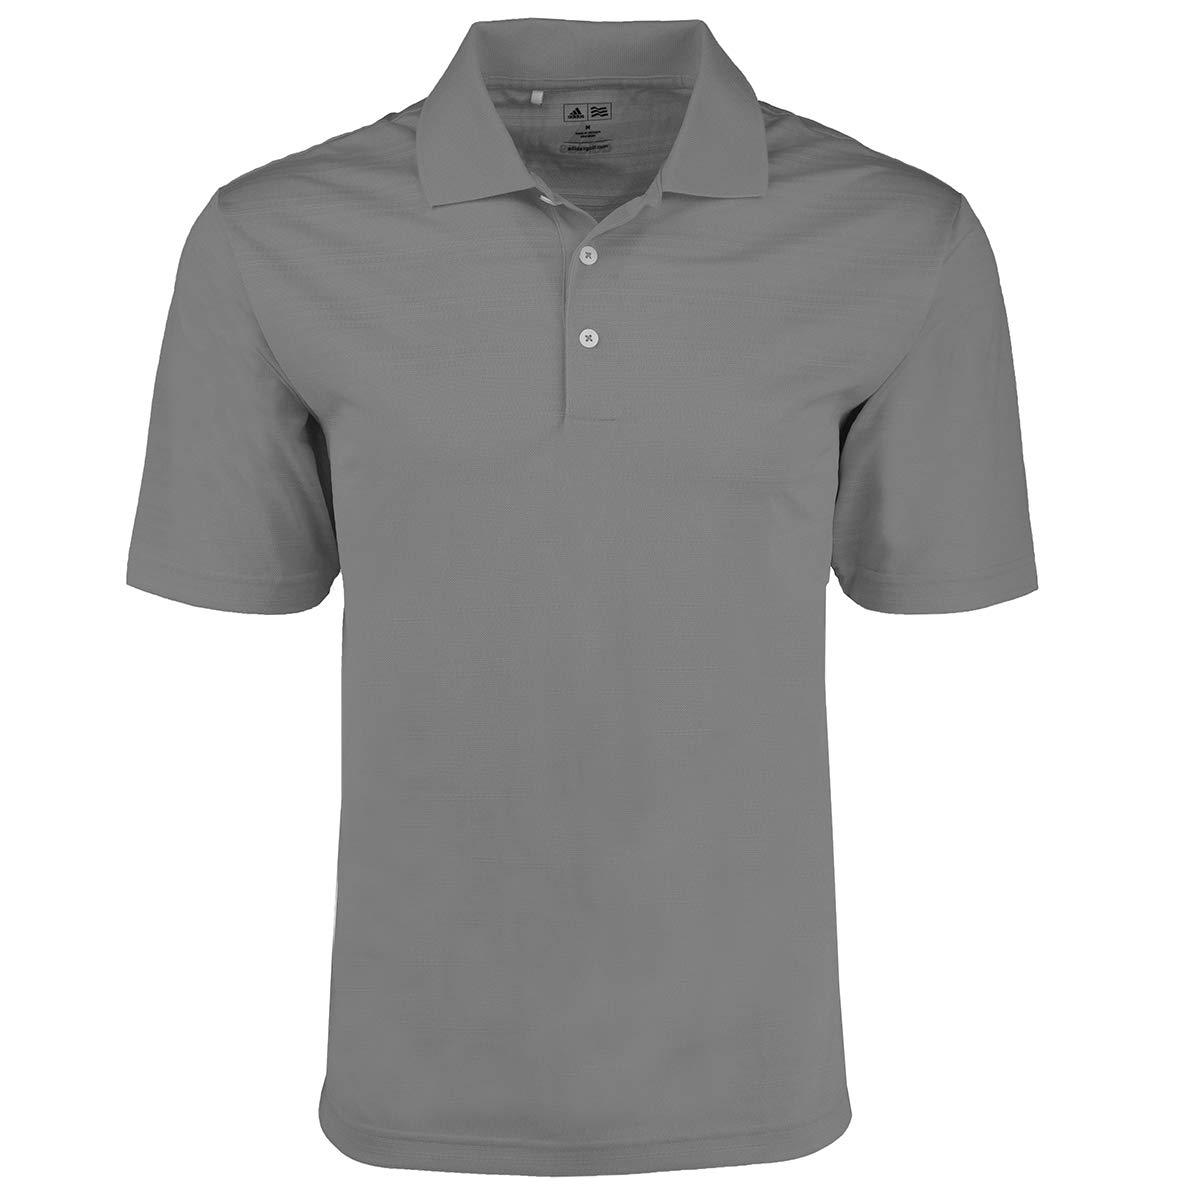 adidas Golf Mens Climalite Textured Short-Sleeve Polo (A161) -ASH -S